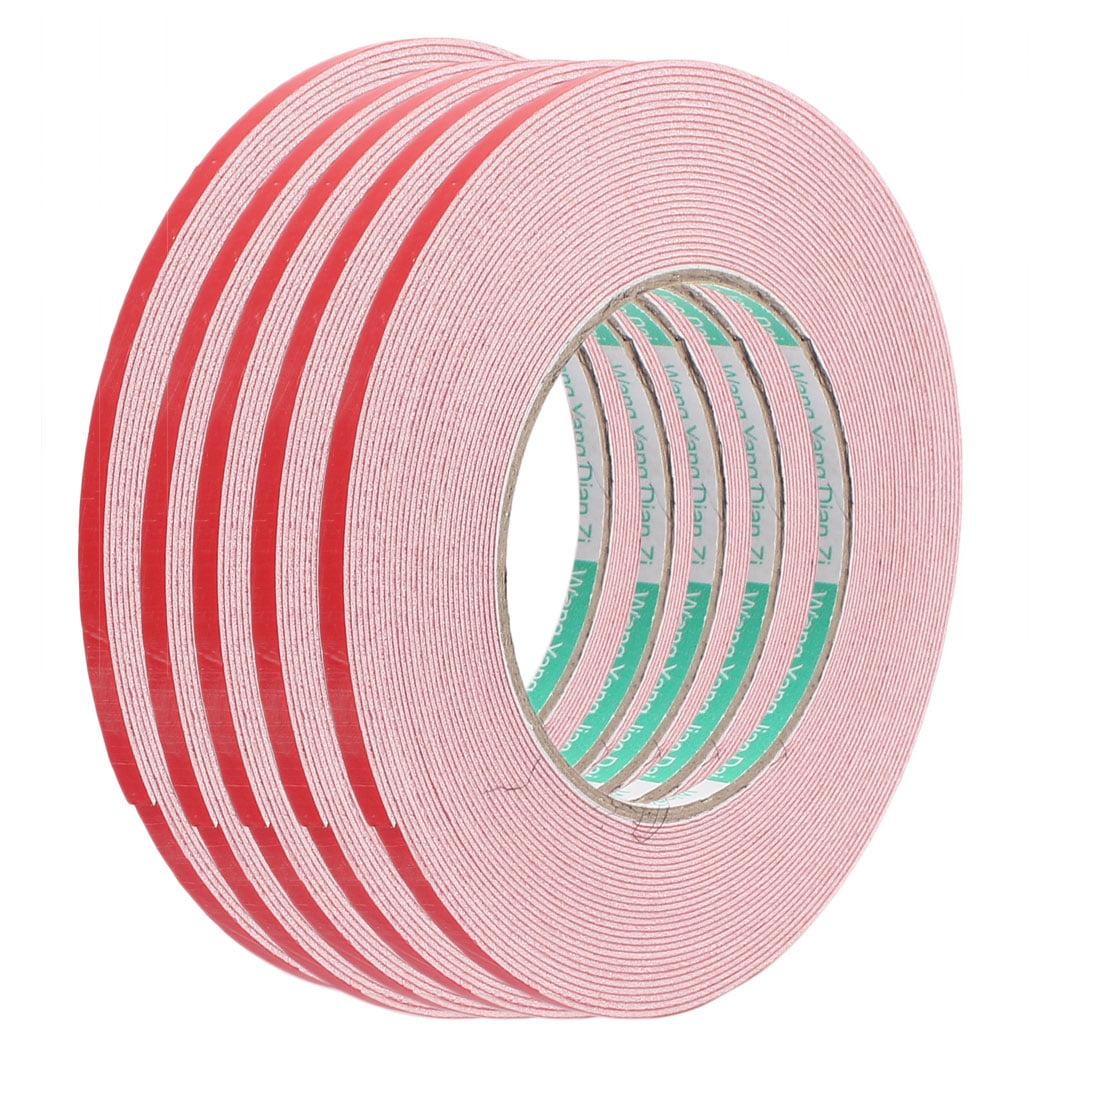 5pcs 10M 5mm x 1mm Dual-side Adhesive Shockproof Sponge Foam Tape Red White